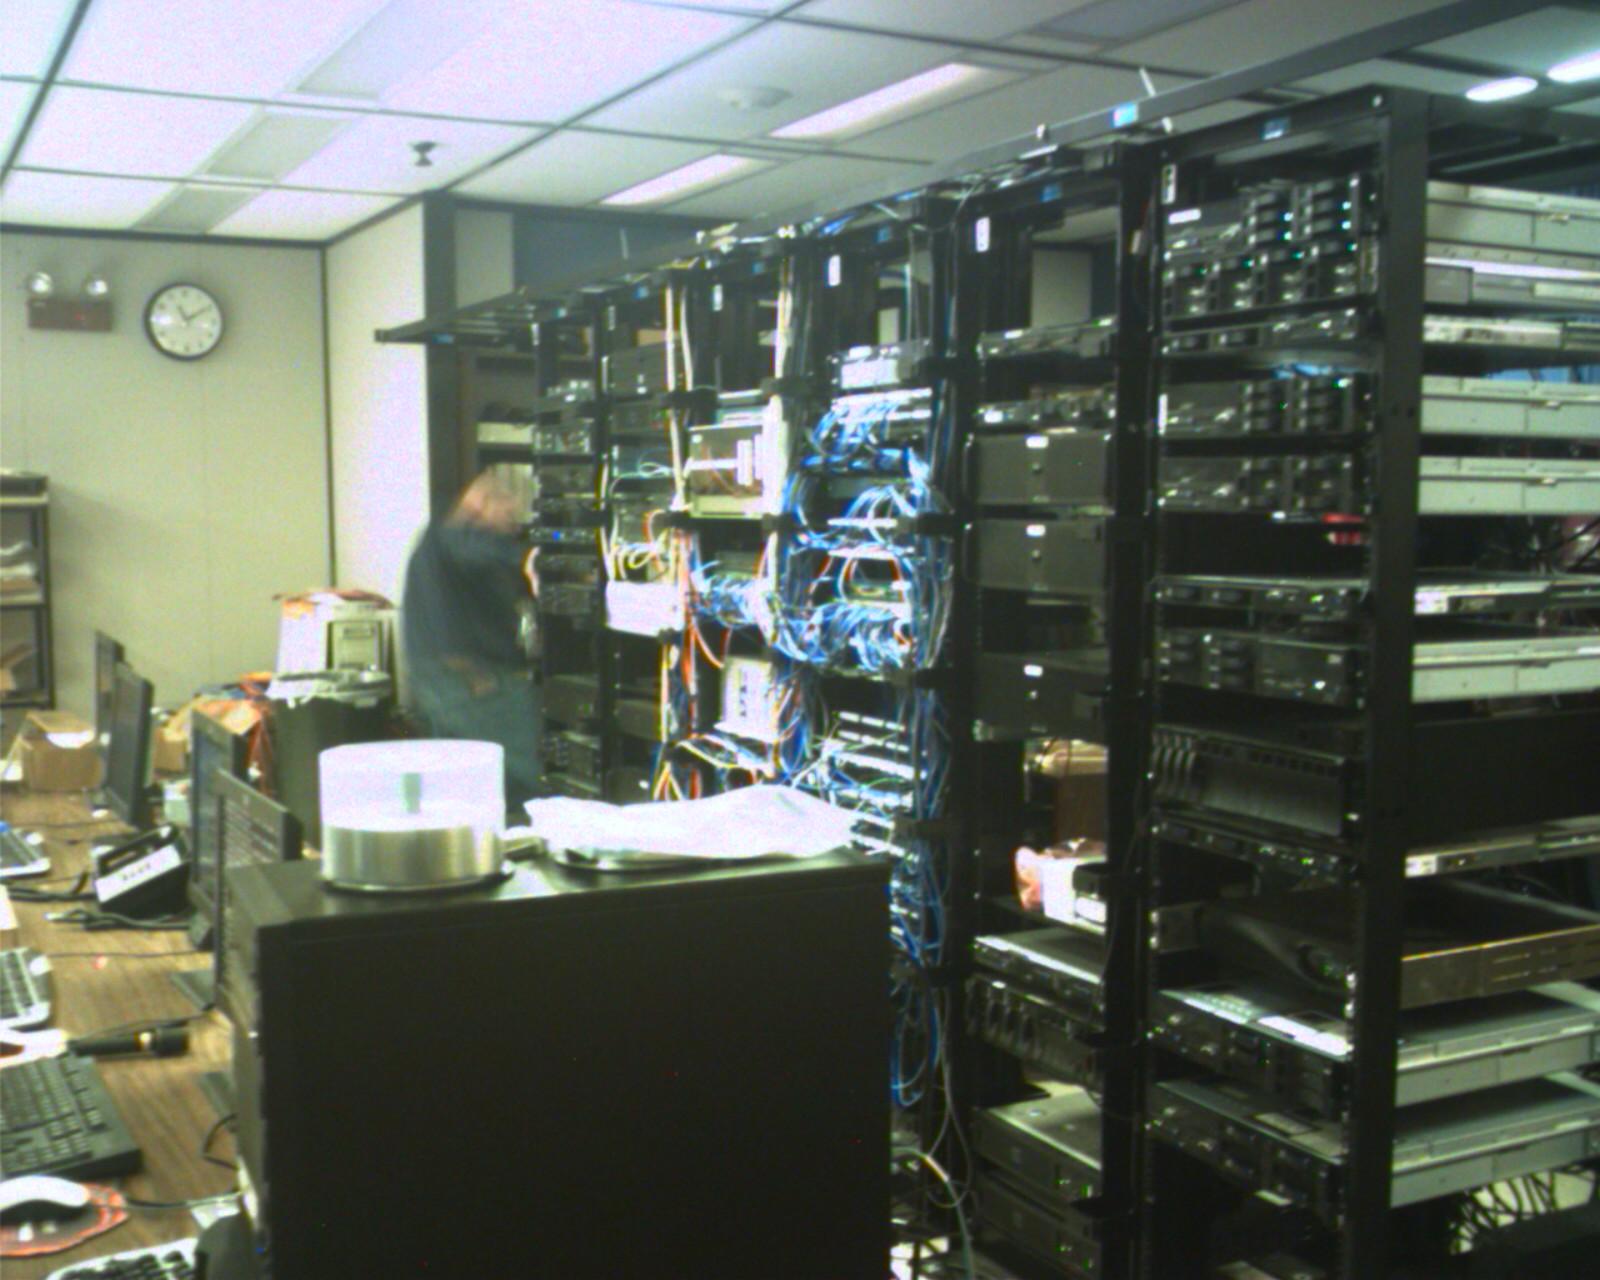 NMU server racks